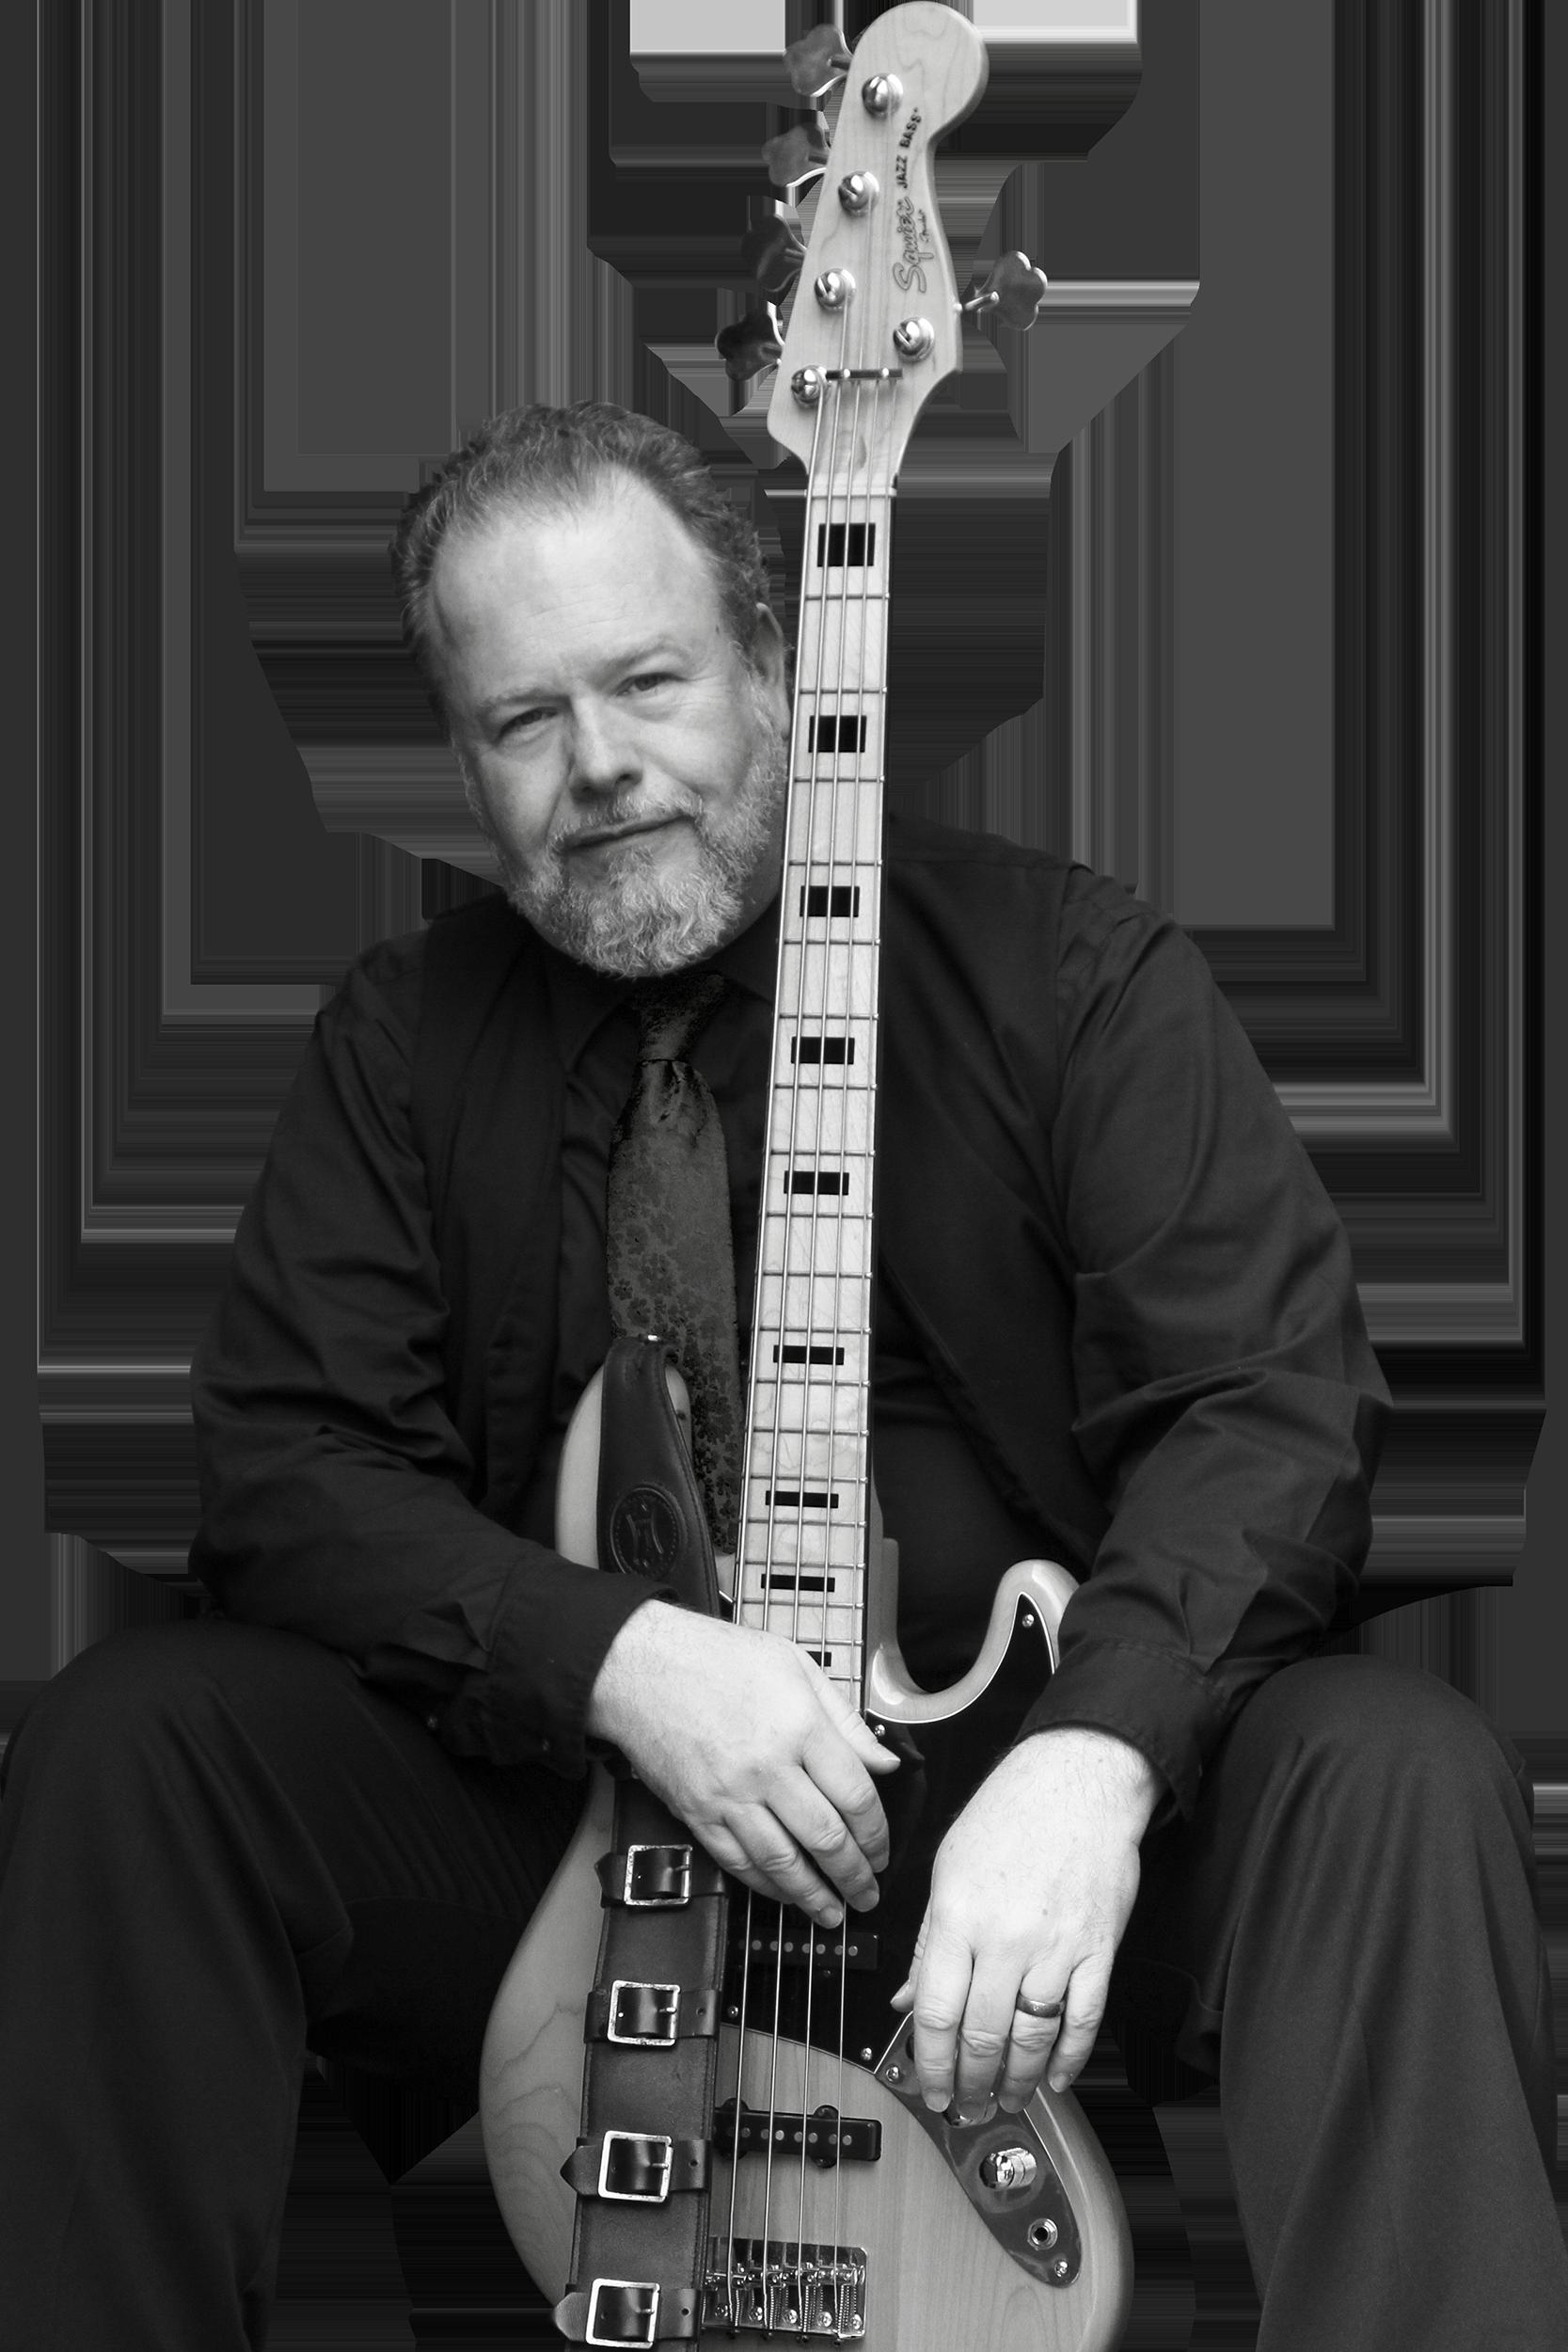 Jim Hornaday